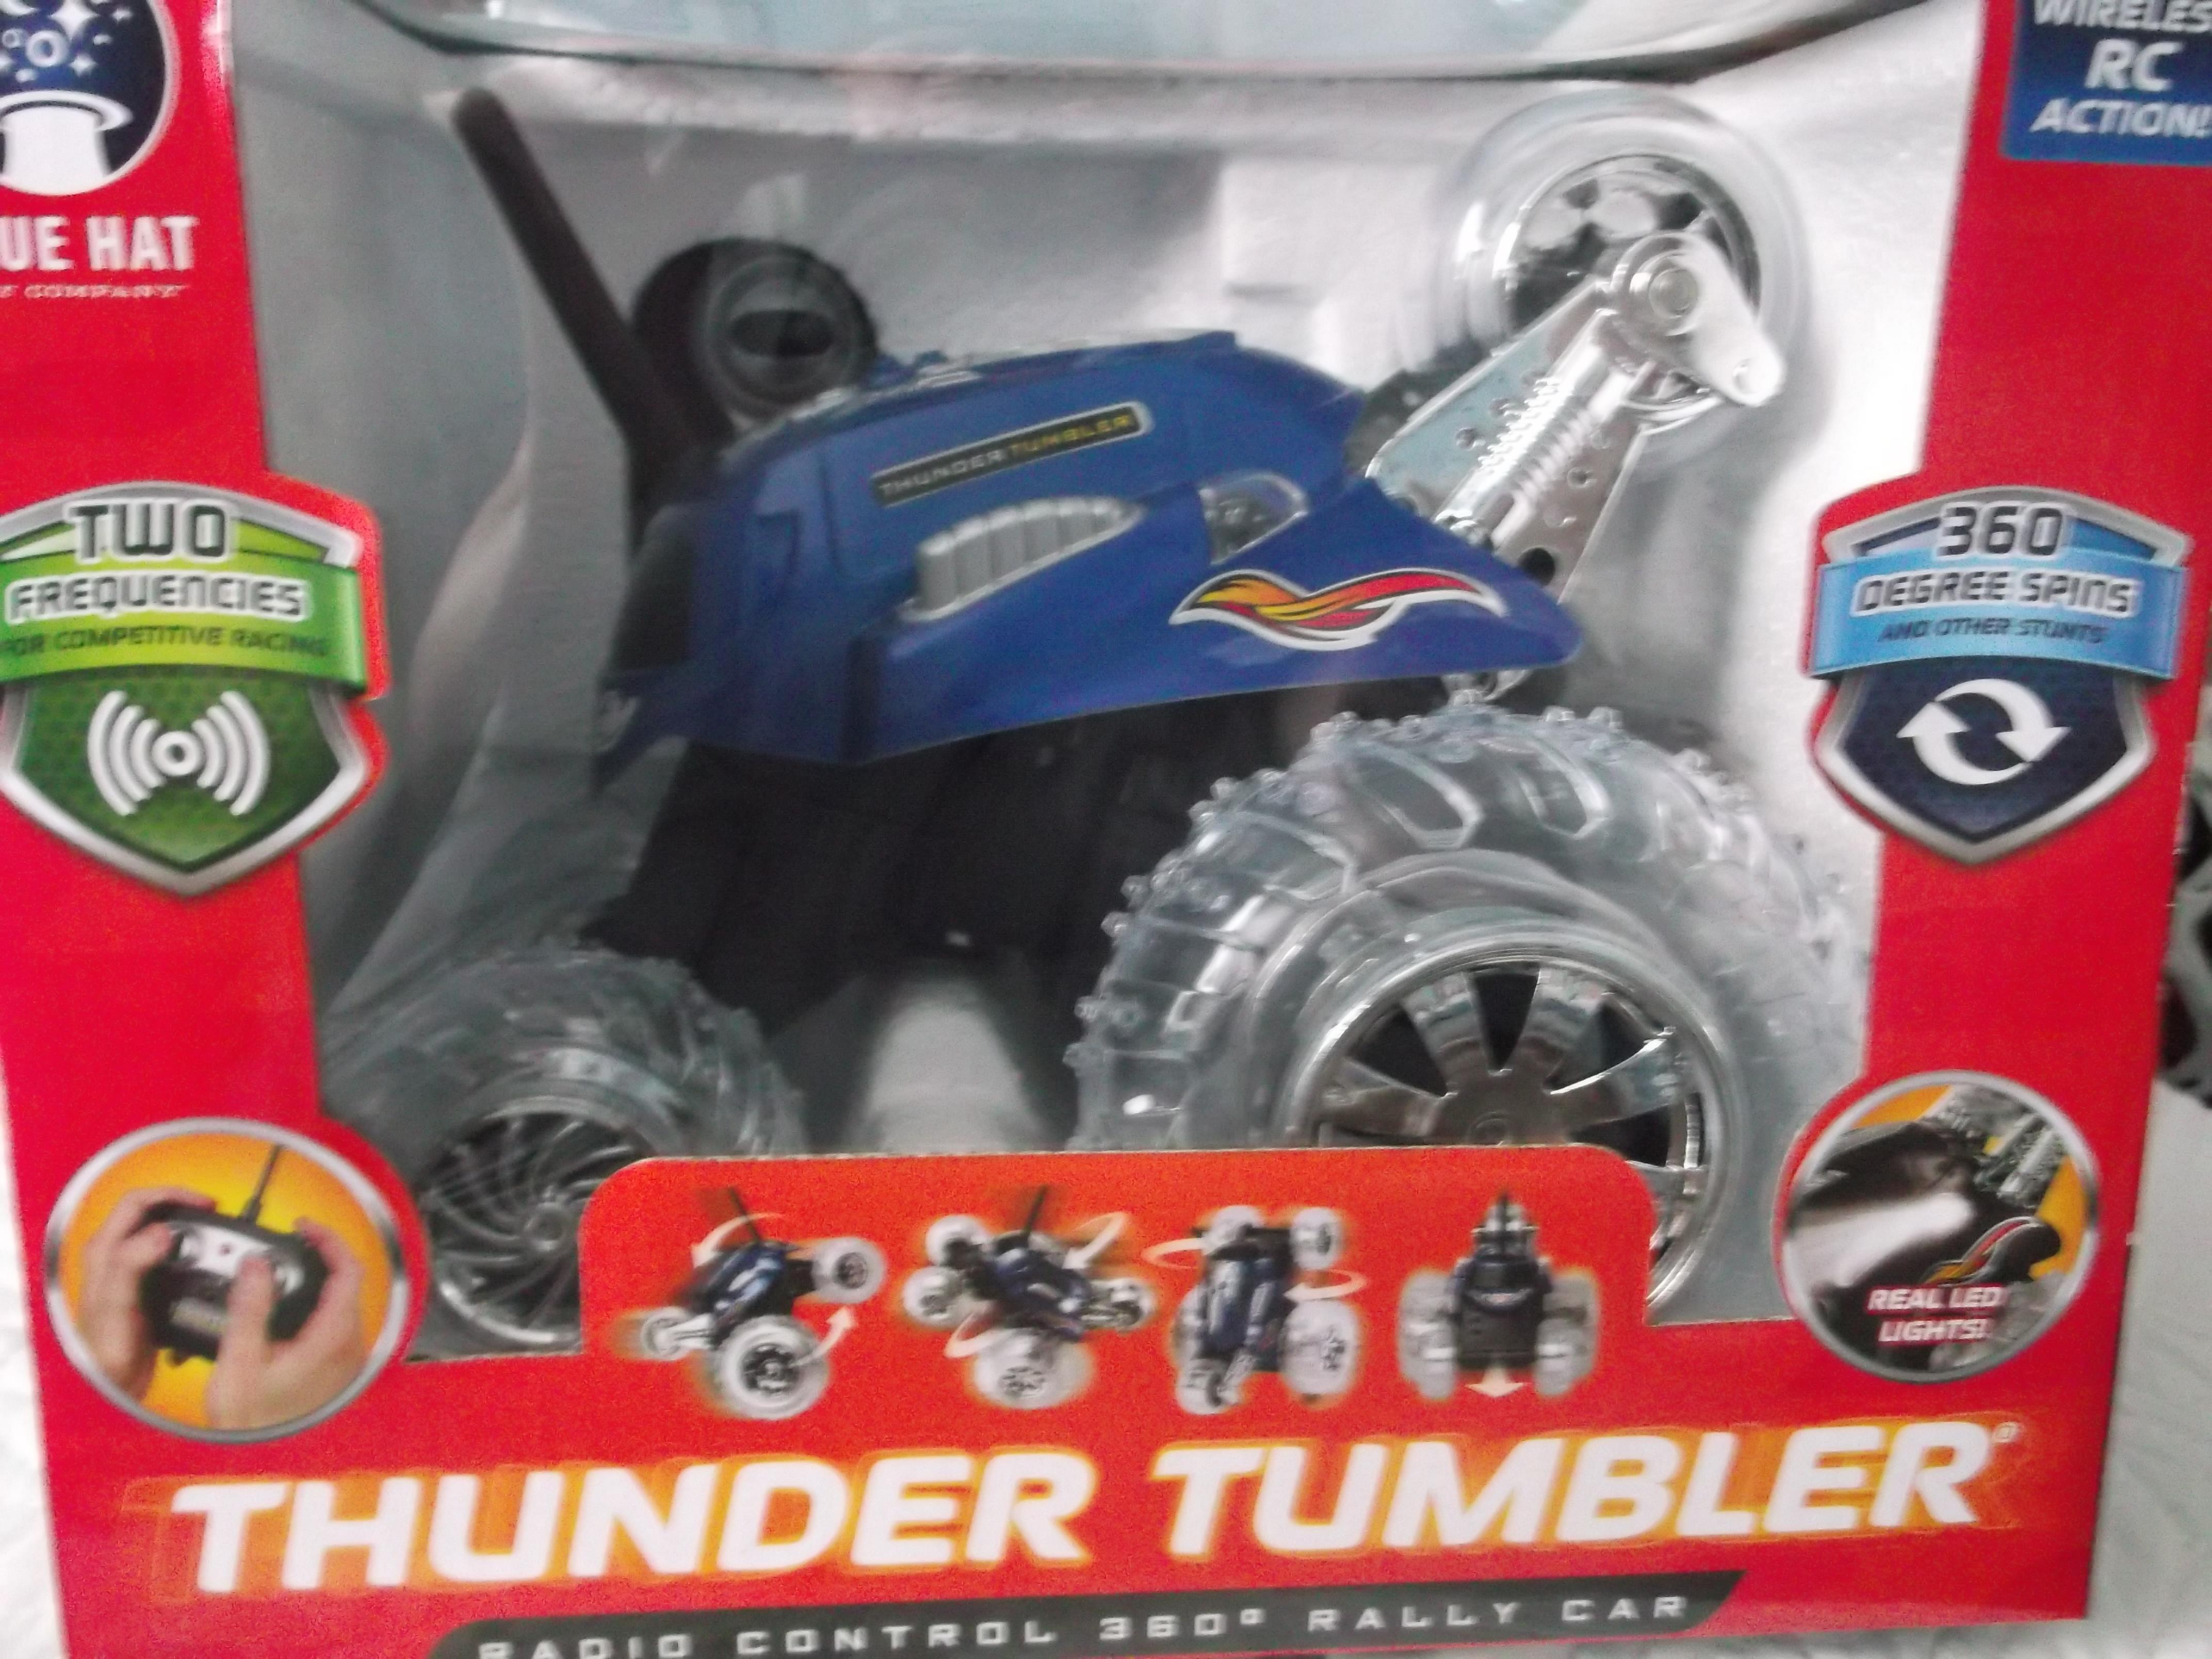 thunder tumbler remote control car walmart with Thunder Tumbler Rally Car on B002HN3RR6 also Mechsource Thunder Tumbler Rally Car moreover Remotecontrol likewise Thunder Tumbler Rally Car further Fur Bean Bags.